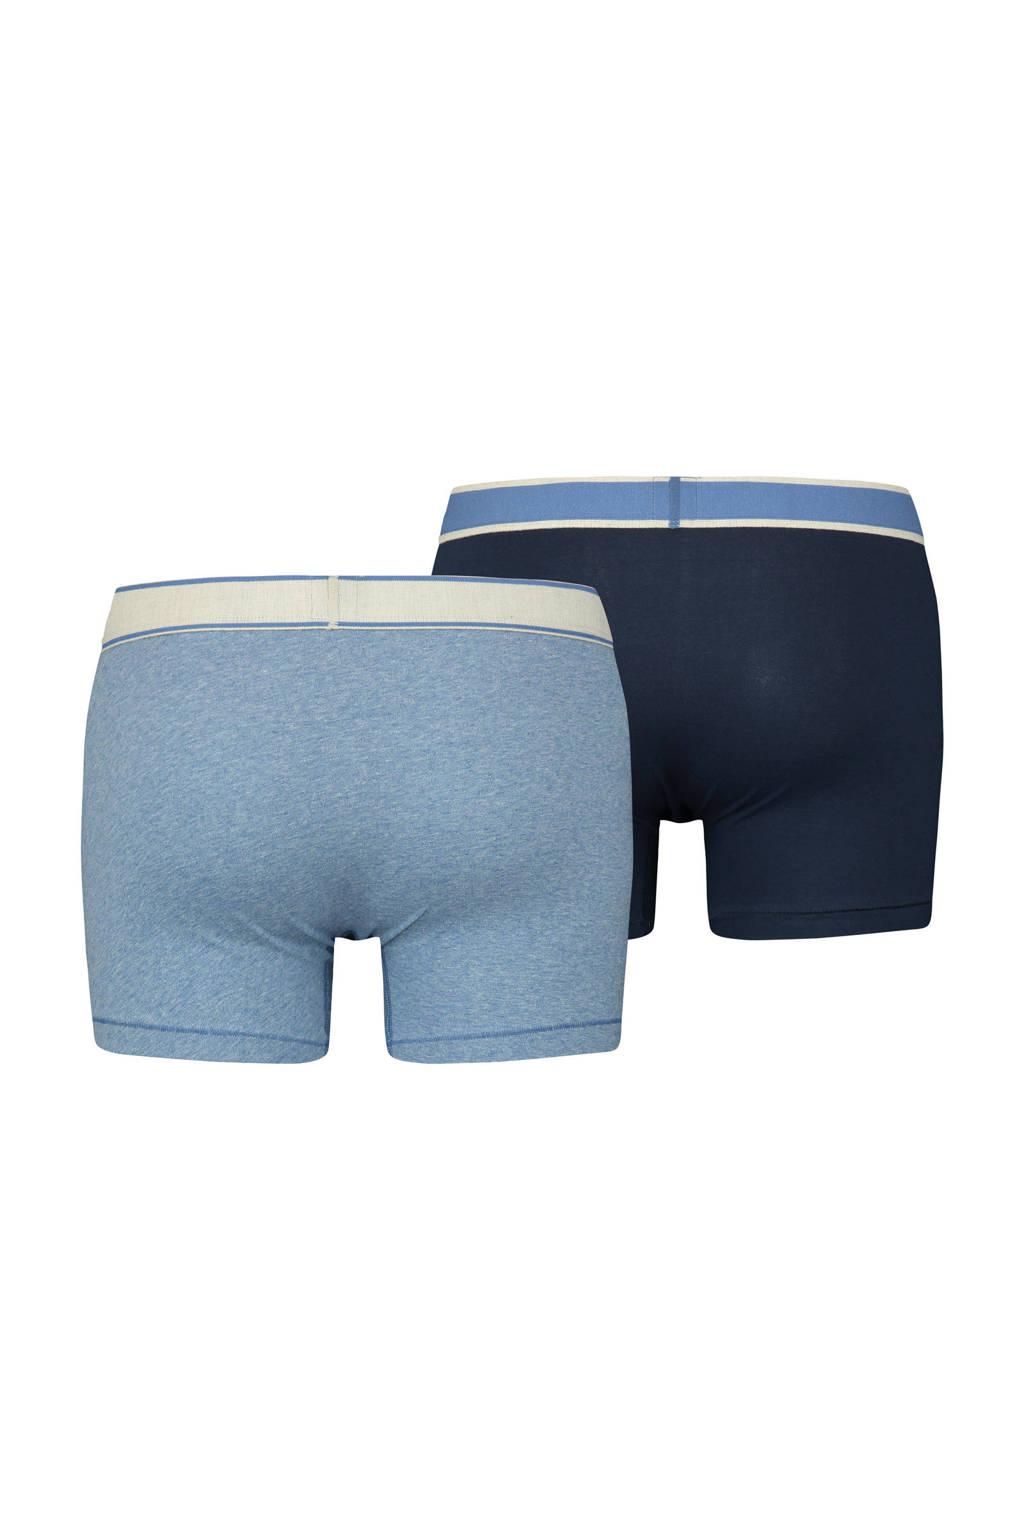 Levi's boxershort (set van 2), Lichtblauw/donkerblauw